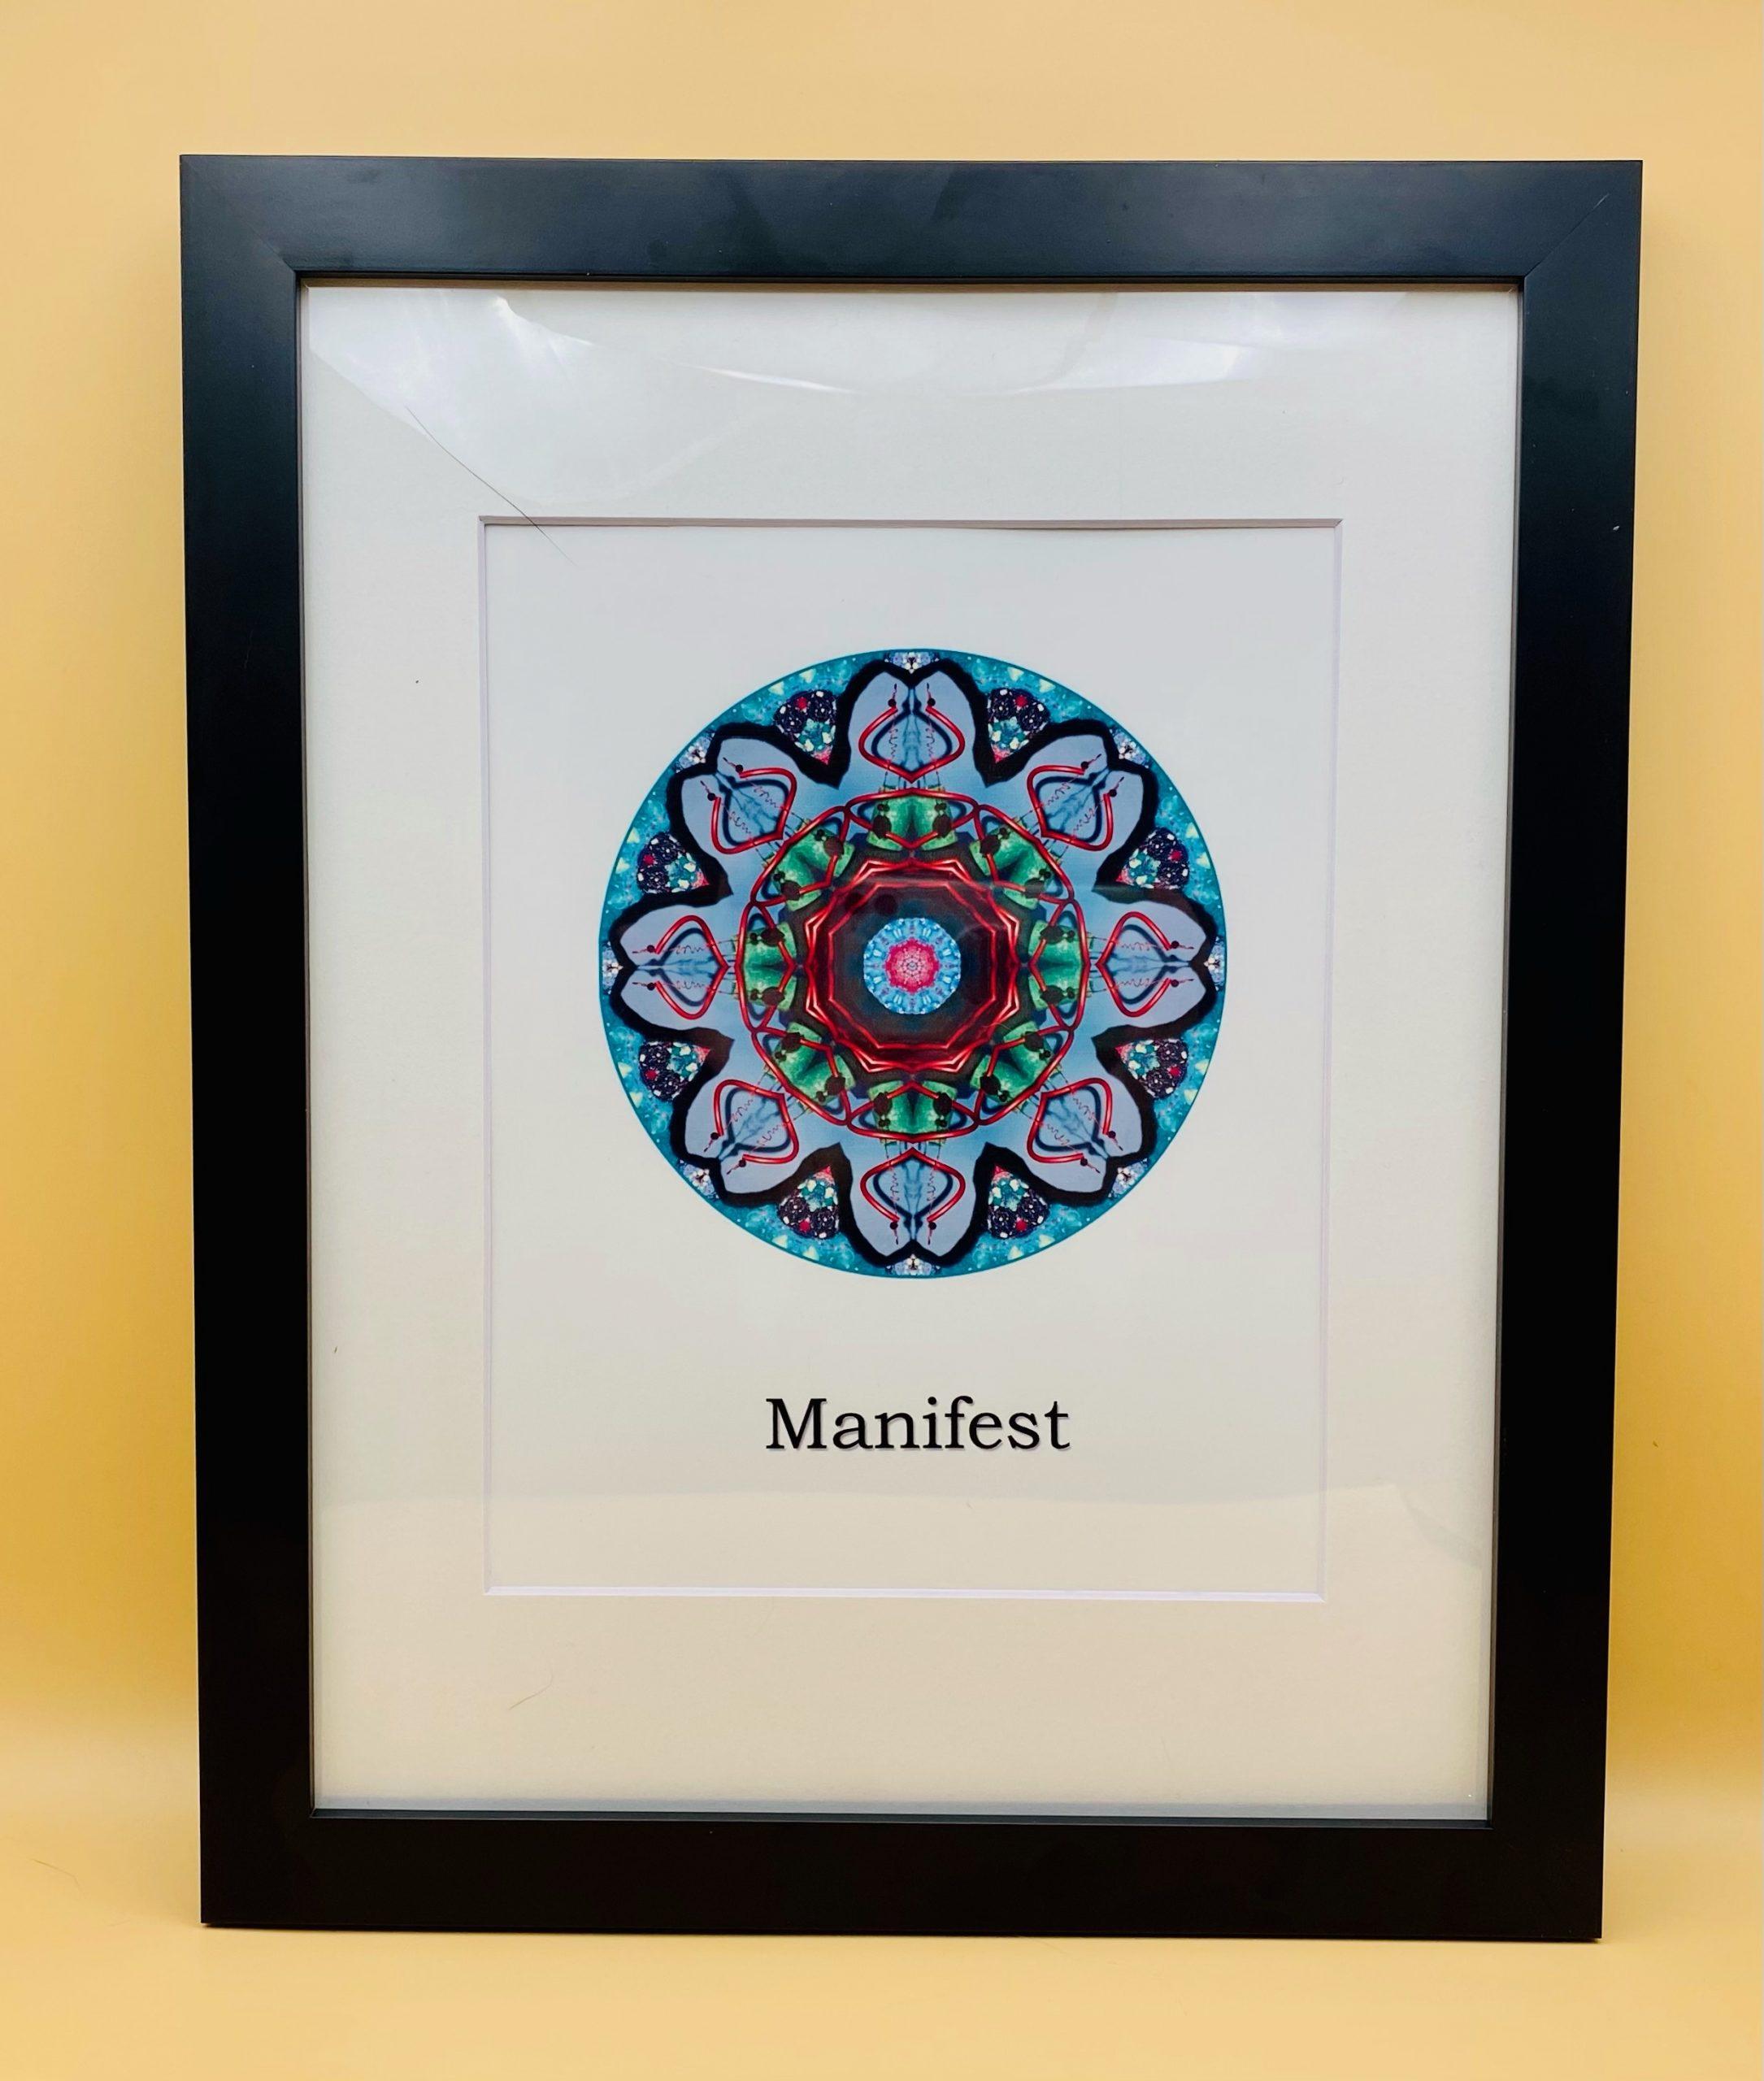 Manifest Mandala Framed Print